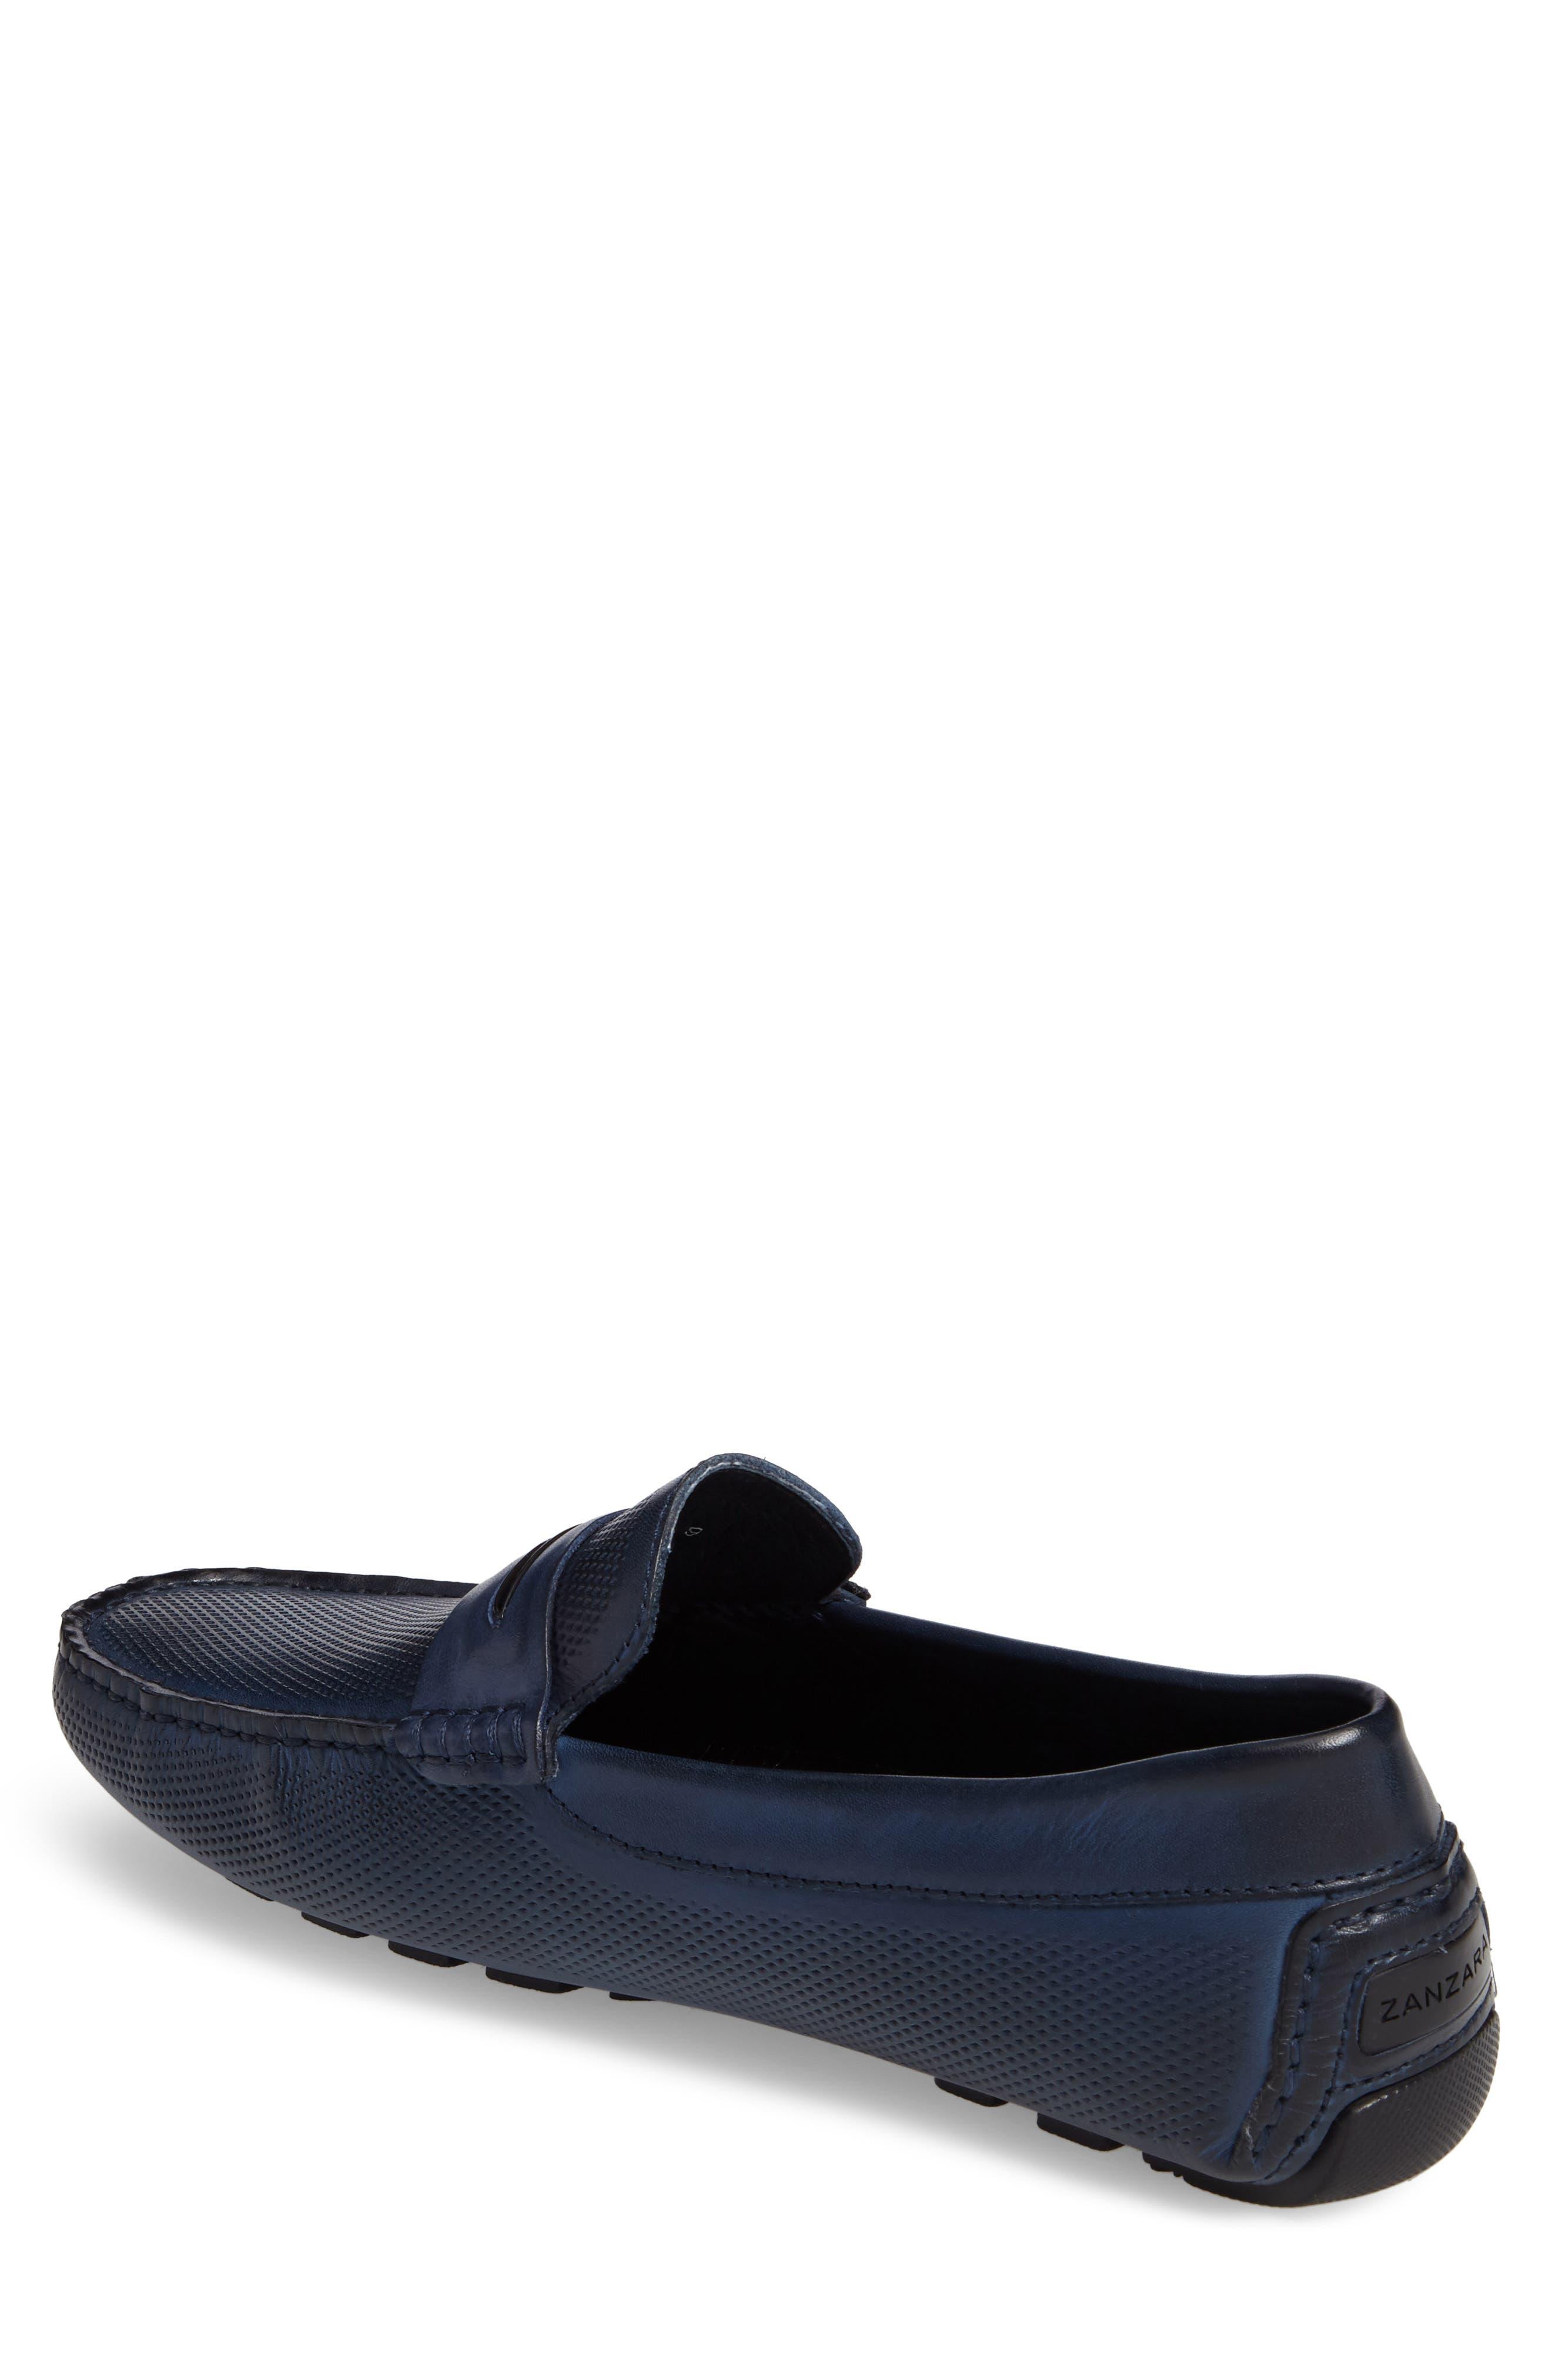 Mondrian Driving Shoe,                             Alternate thumbnail 2, color,                             Blue Leather